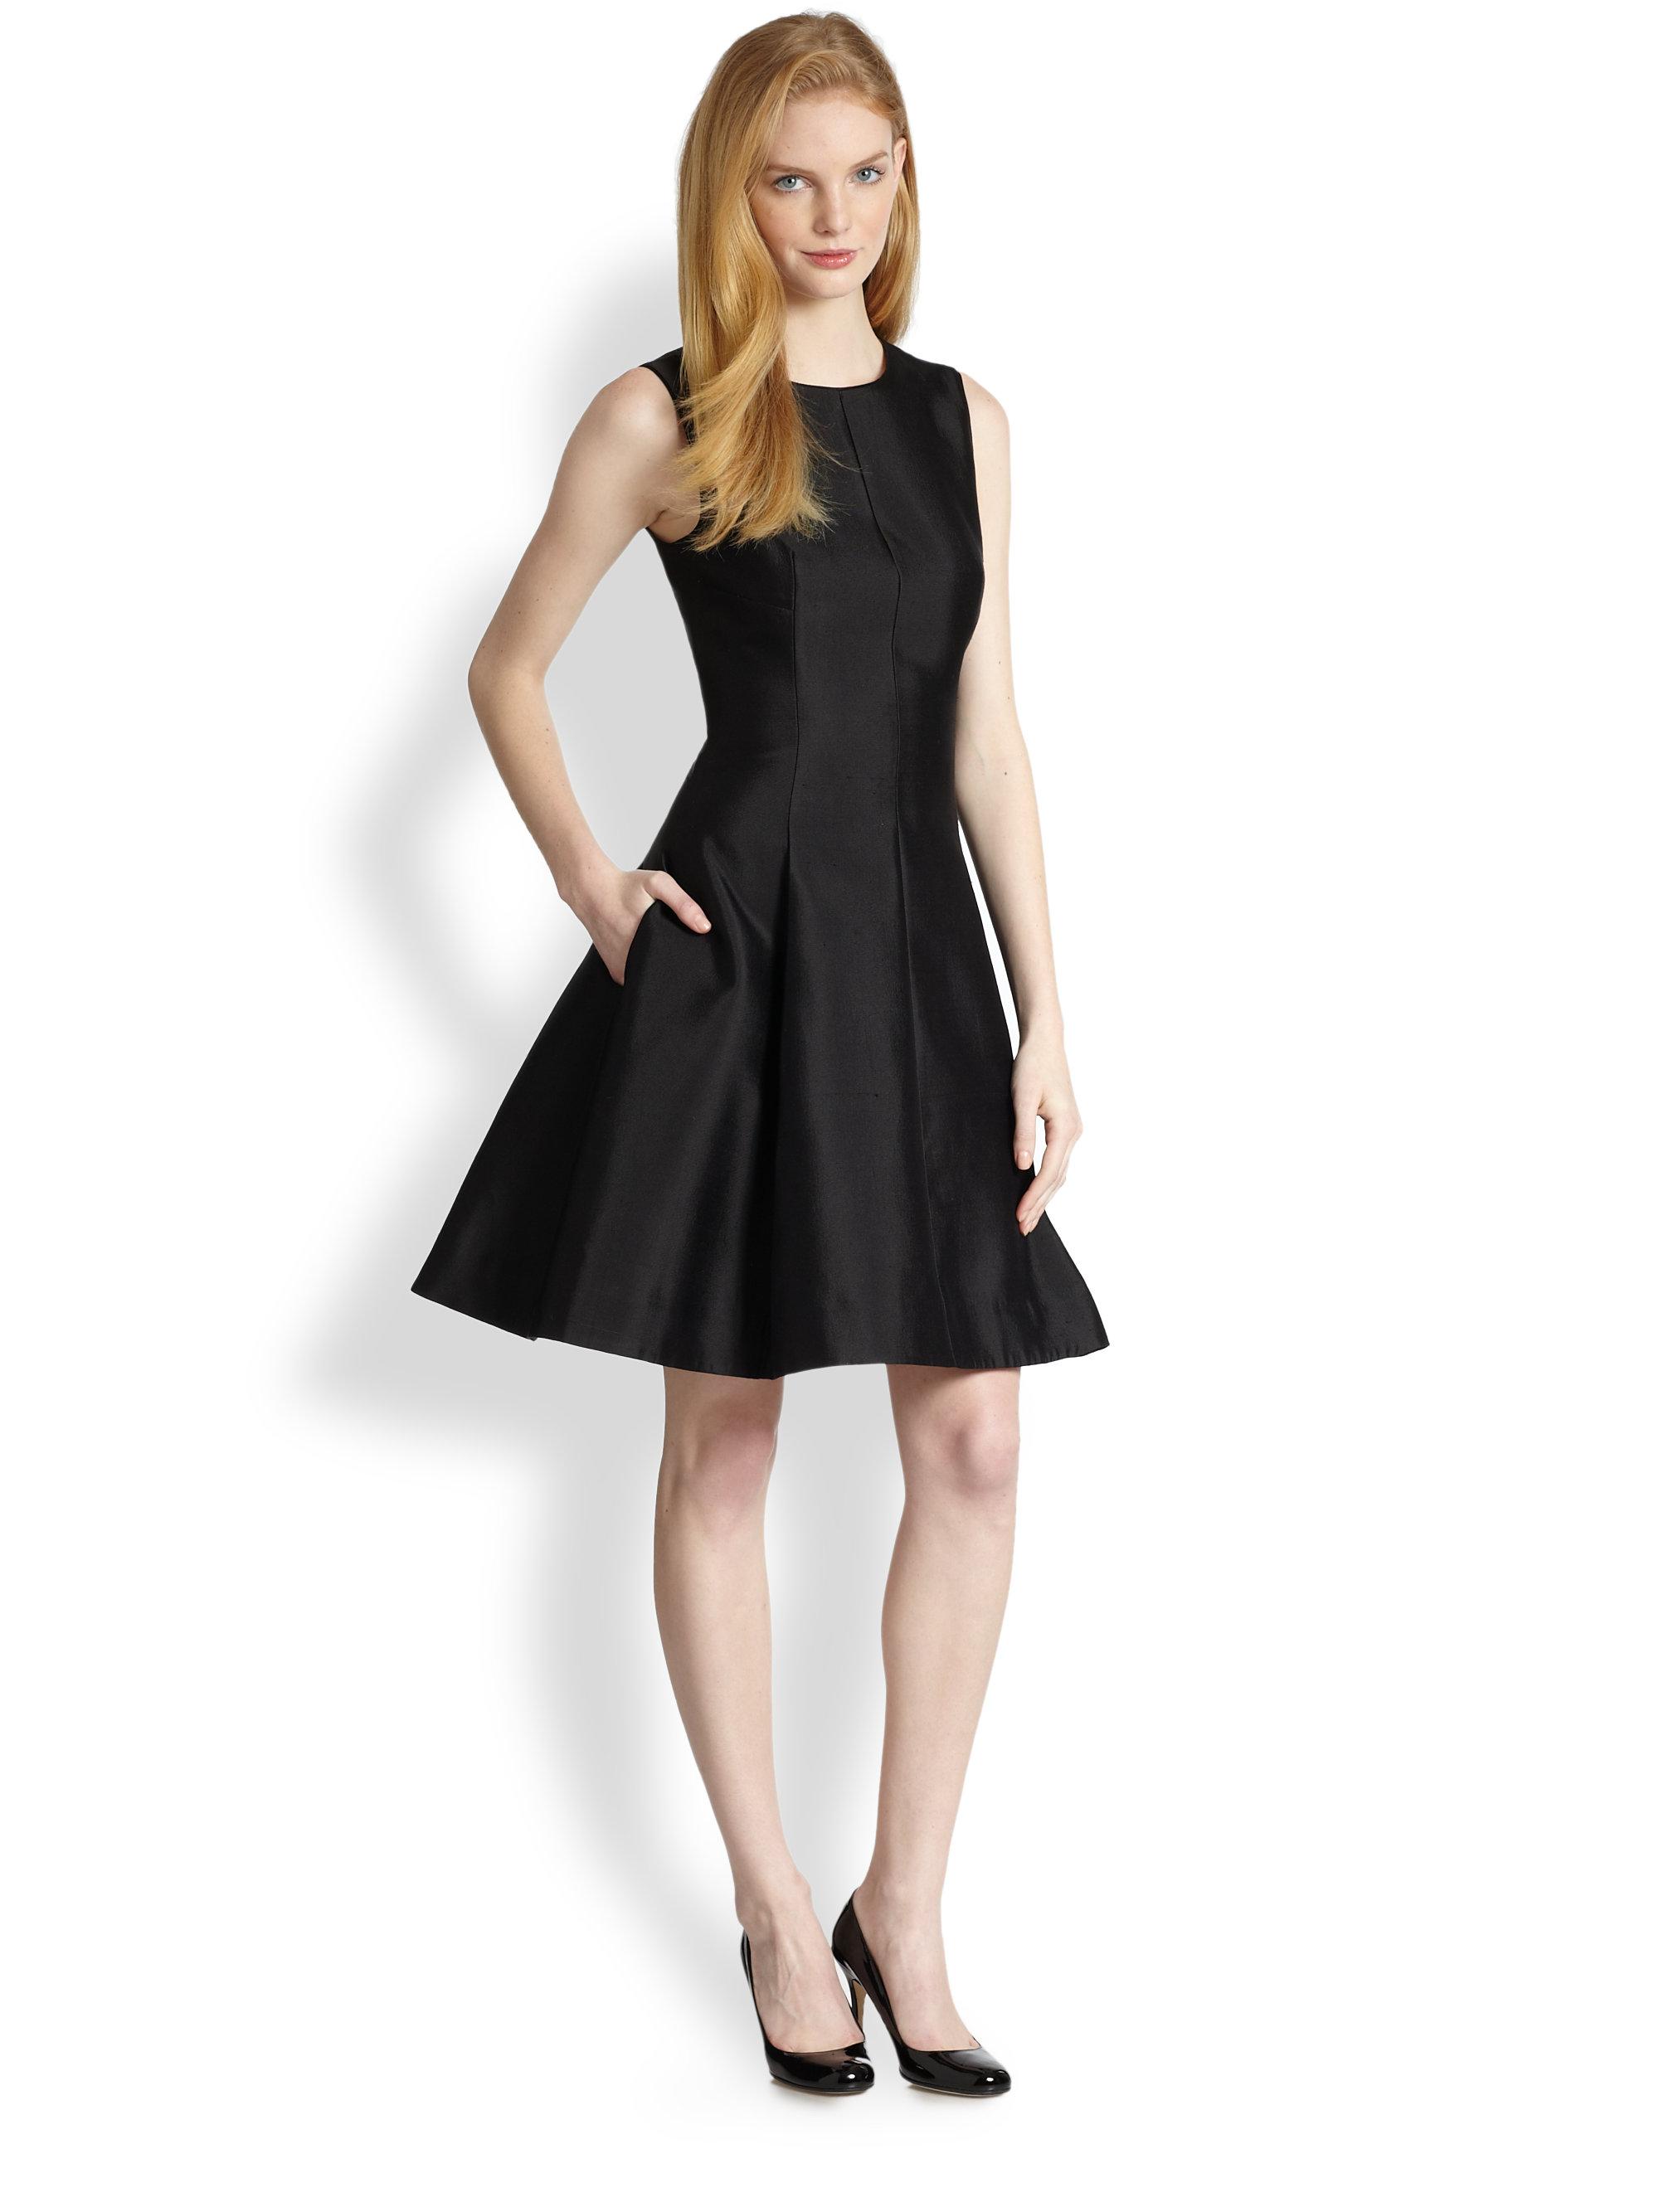 Kate spade new york Emma Dress in Black | Lyst